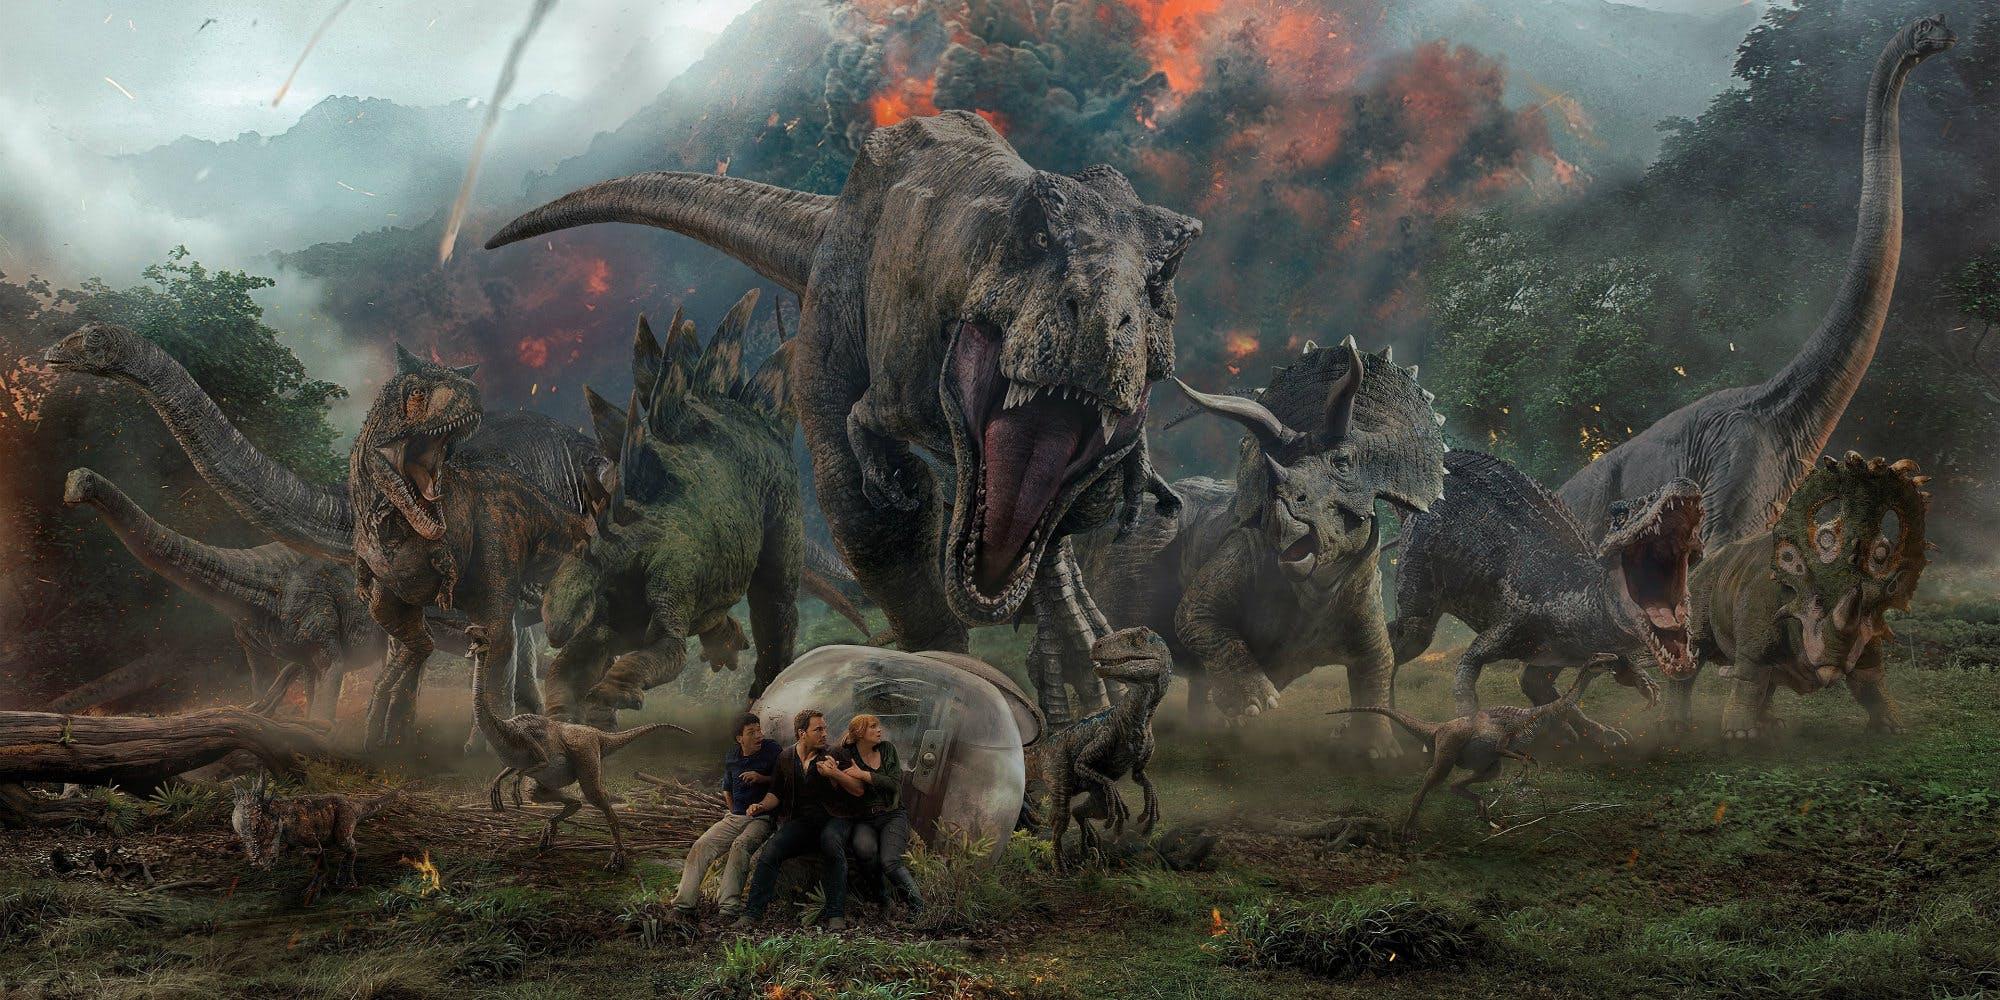 「Jurassic World: Fallen Kingdom」の画像検索結果